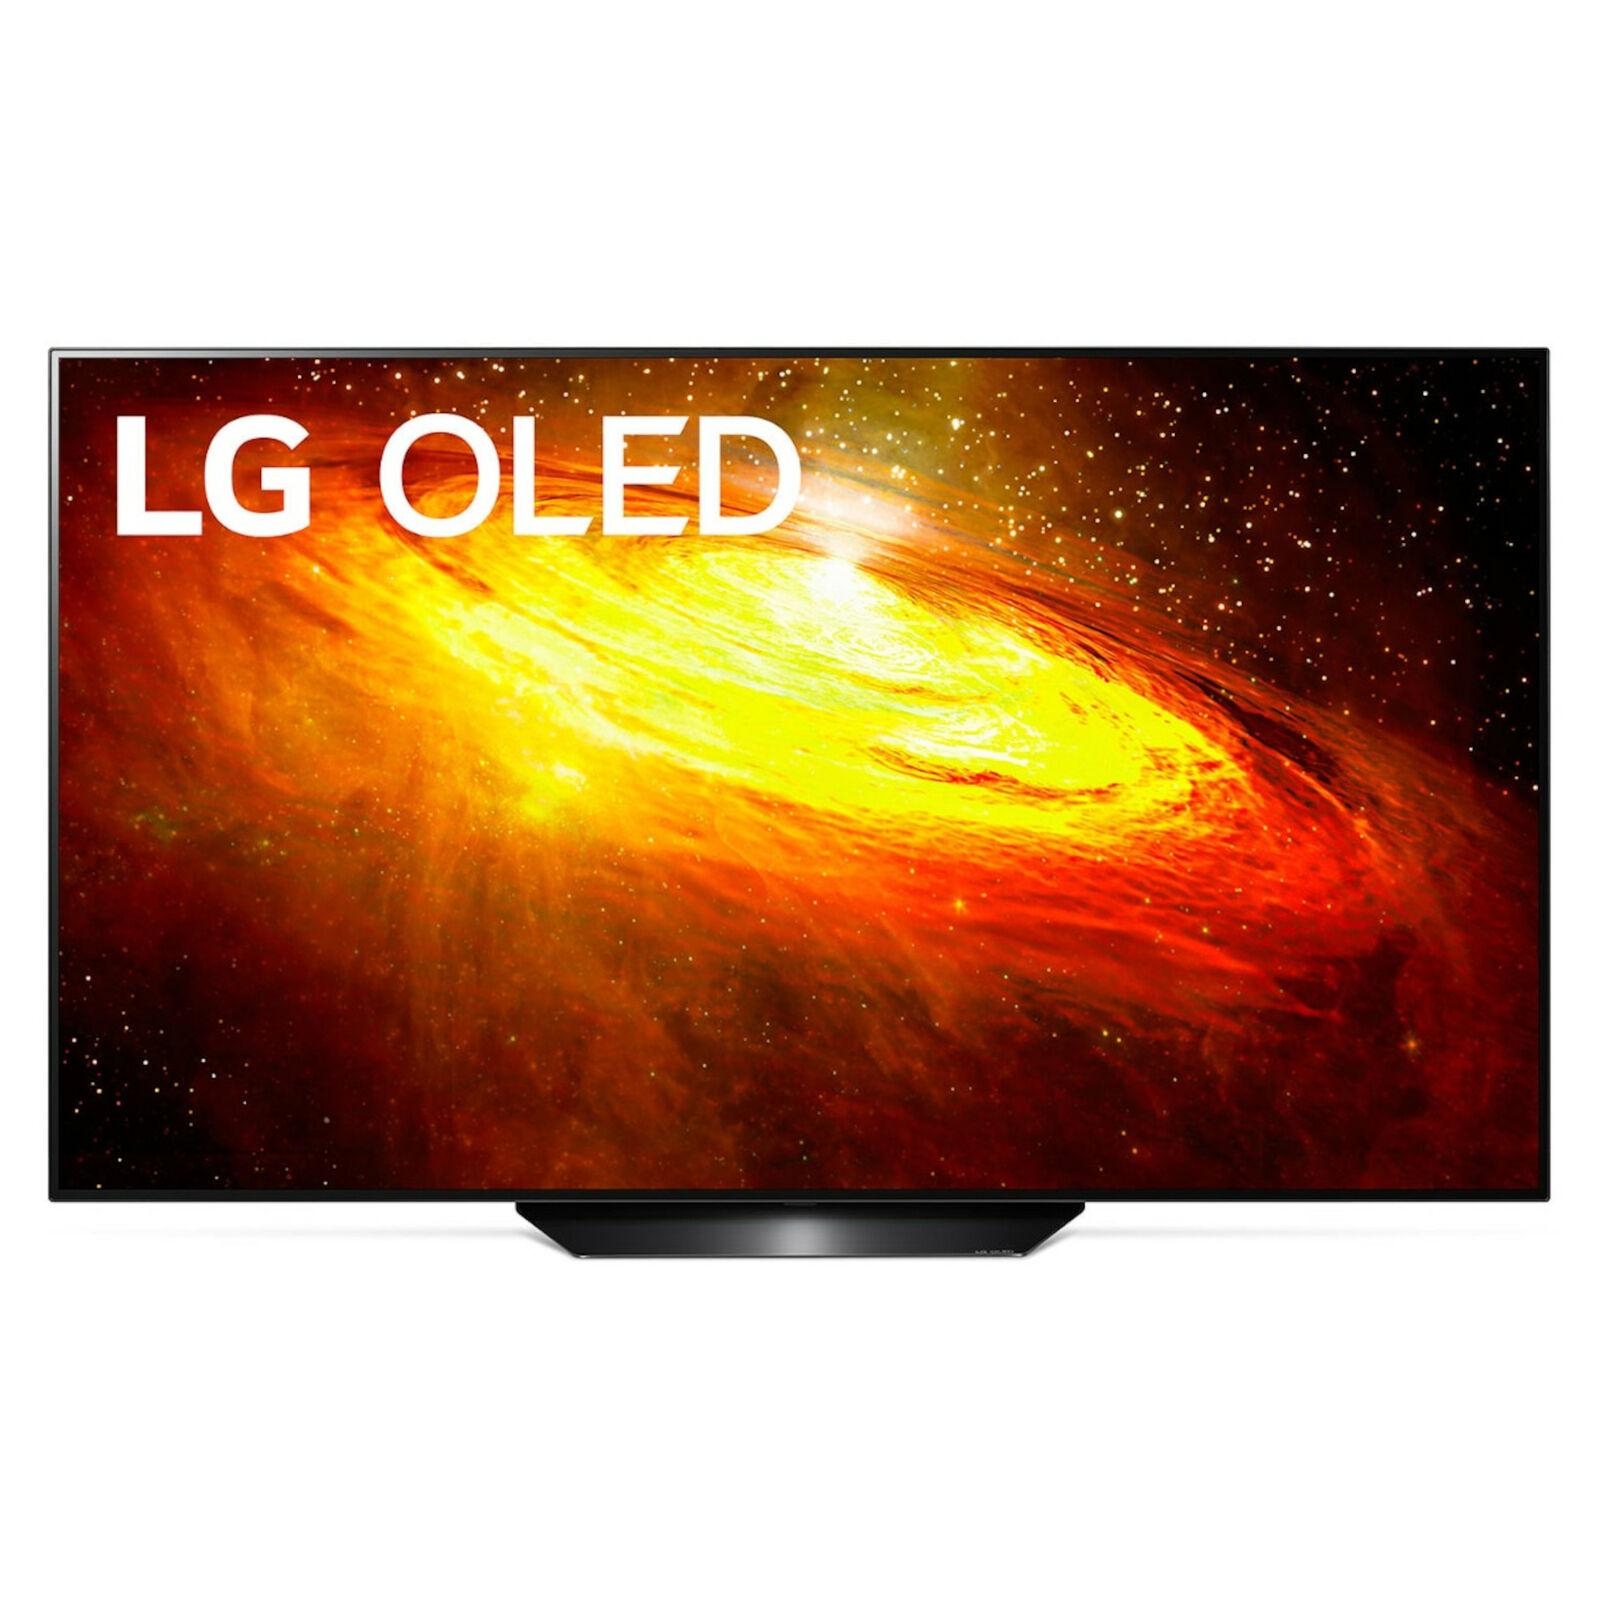 LG OLED55BX6LB 55 OLED 4K Ultra HD Smart TV + 5 year warranty £889 with code @ Hughes Ebay